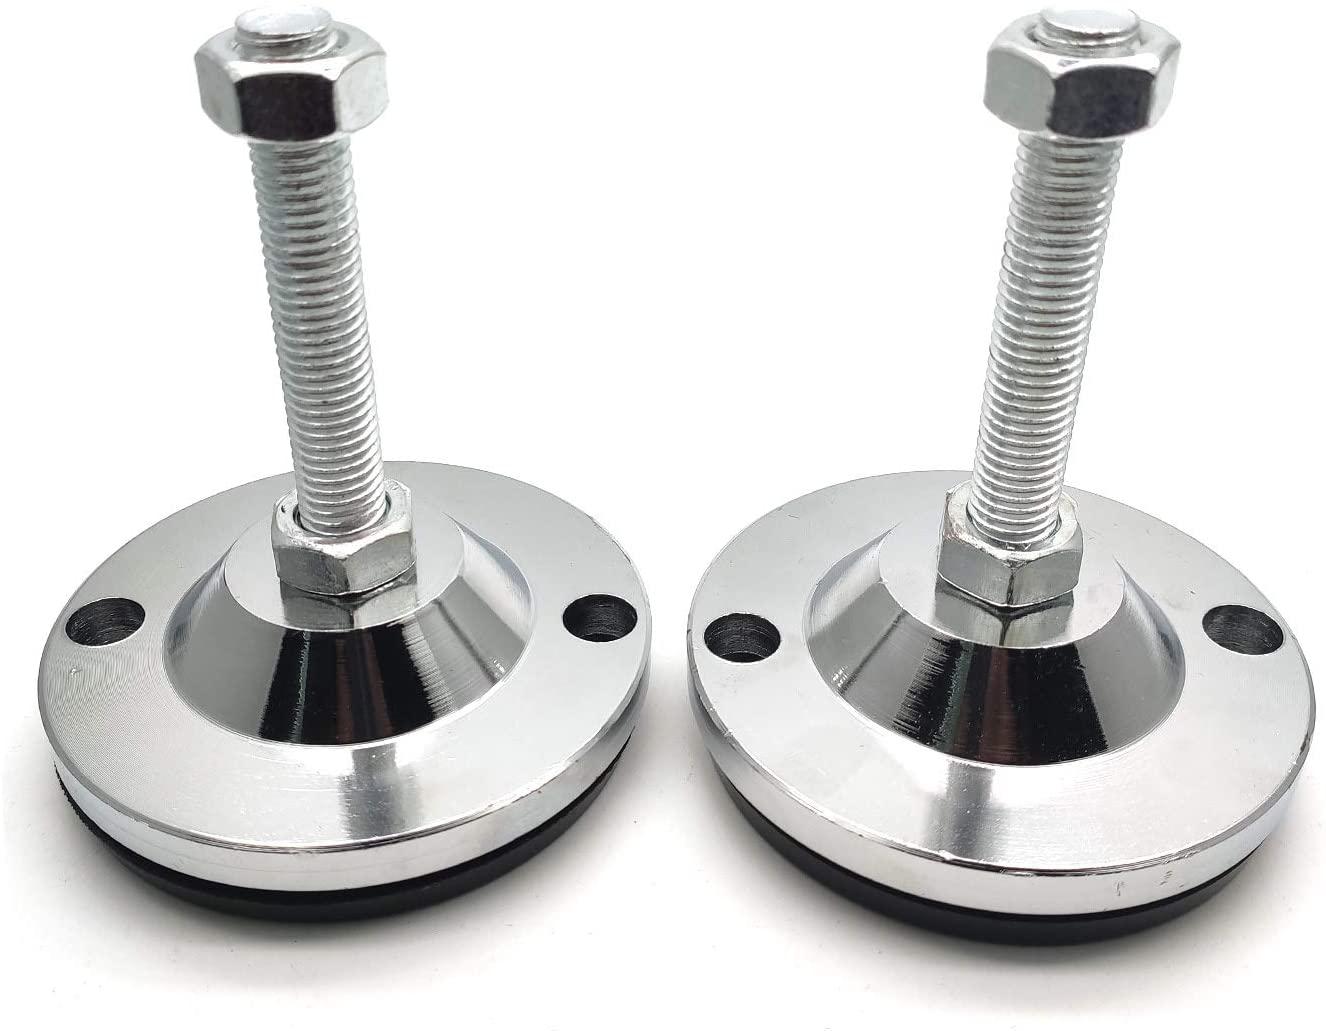 Furniture Levelers Addlike Machine Leveling Feet 3.9